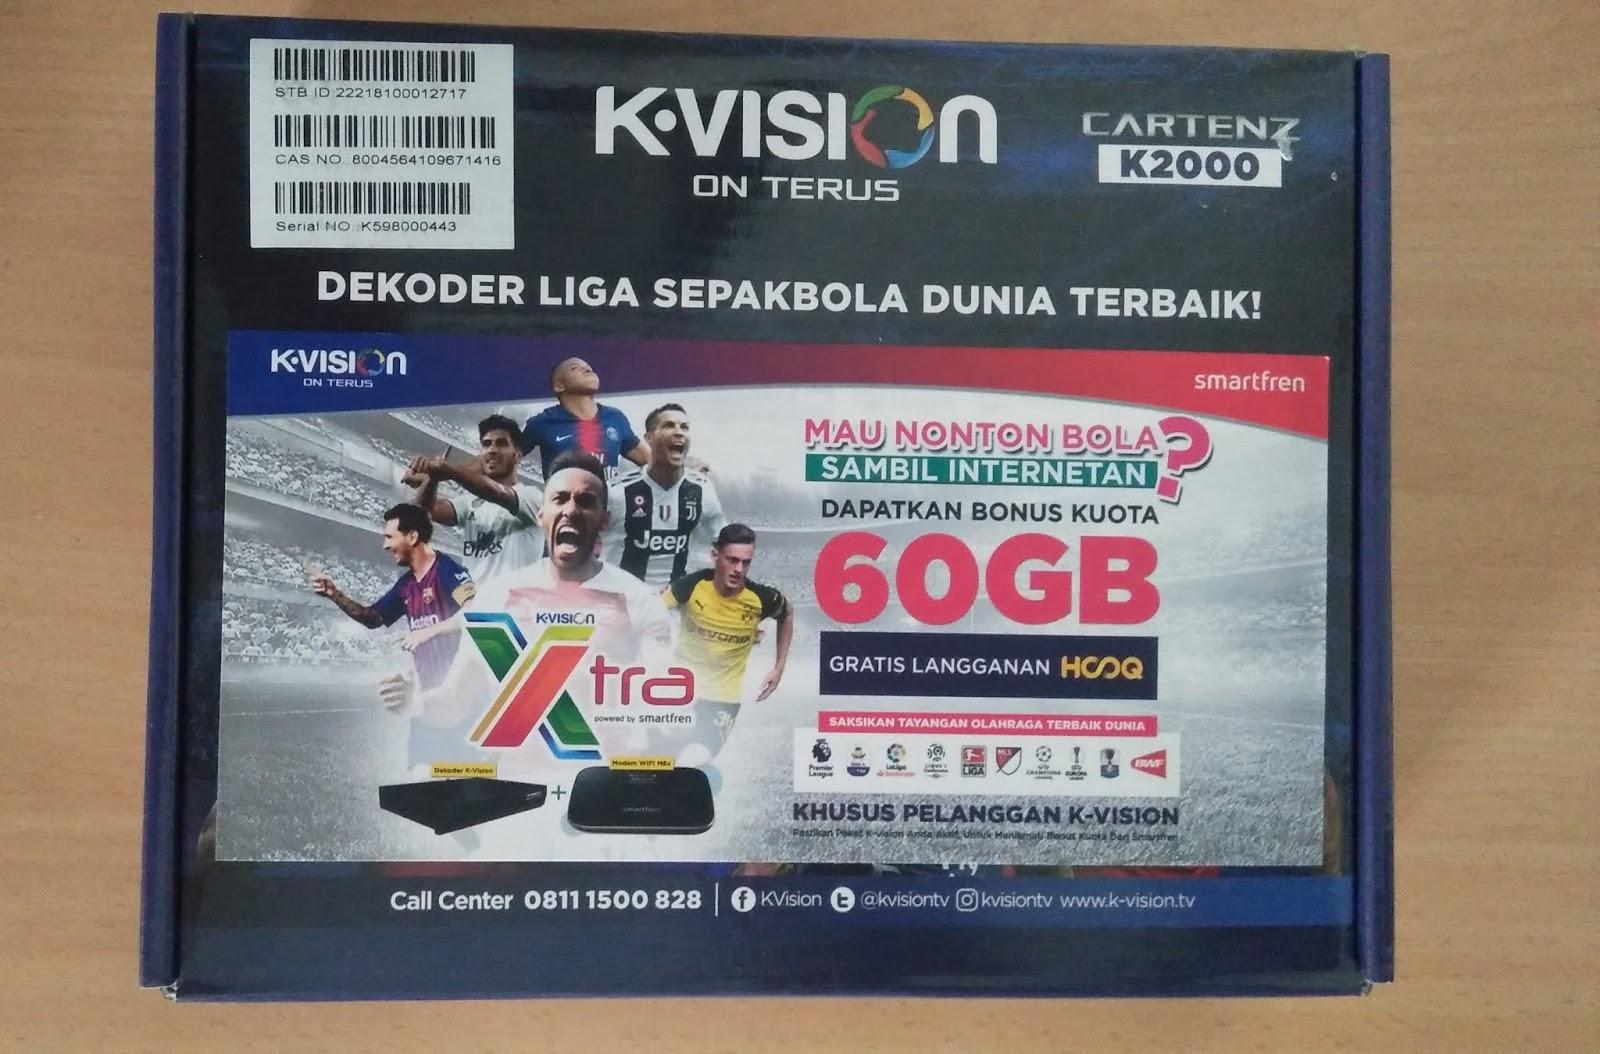 Unboxing K Vision Xtra Bonus Mifi Smartfren 60gb Cara Mudah Belajar Elektronika Digital